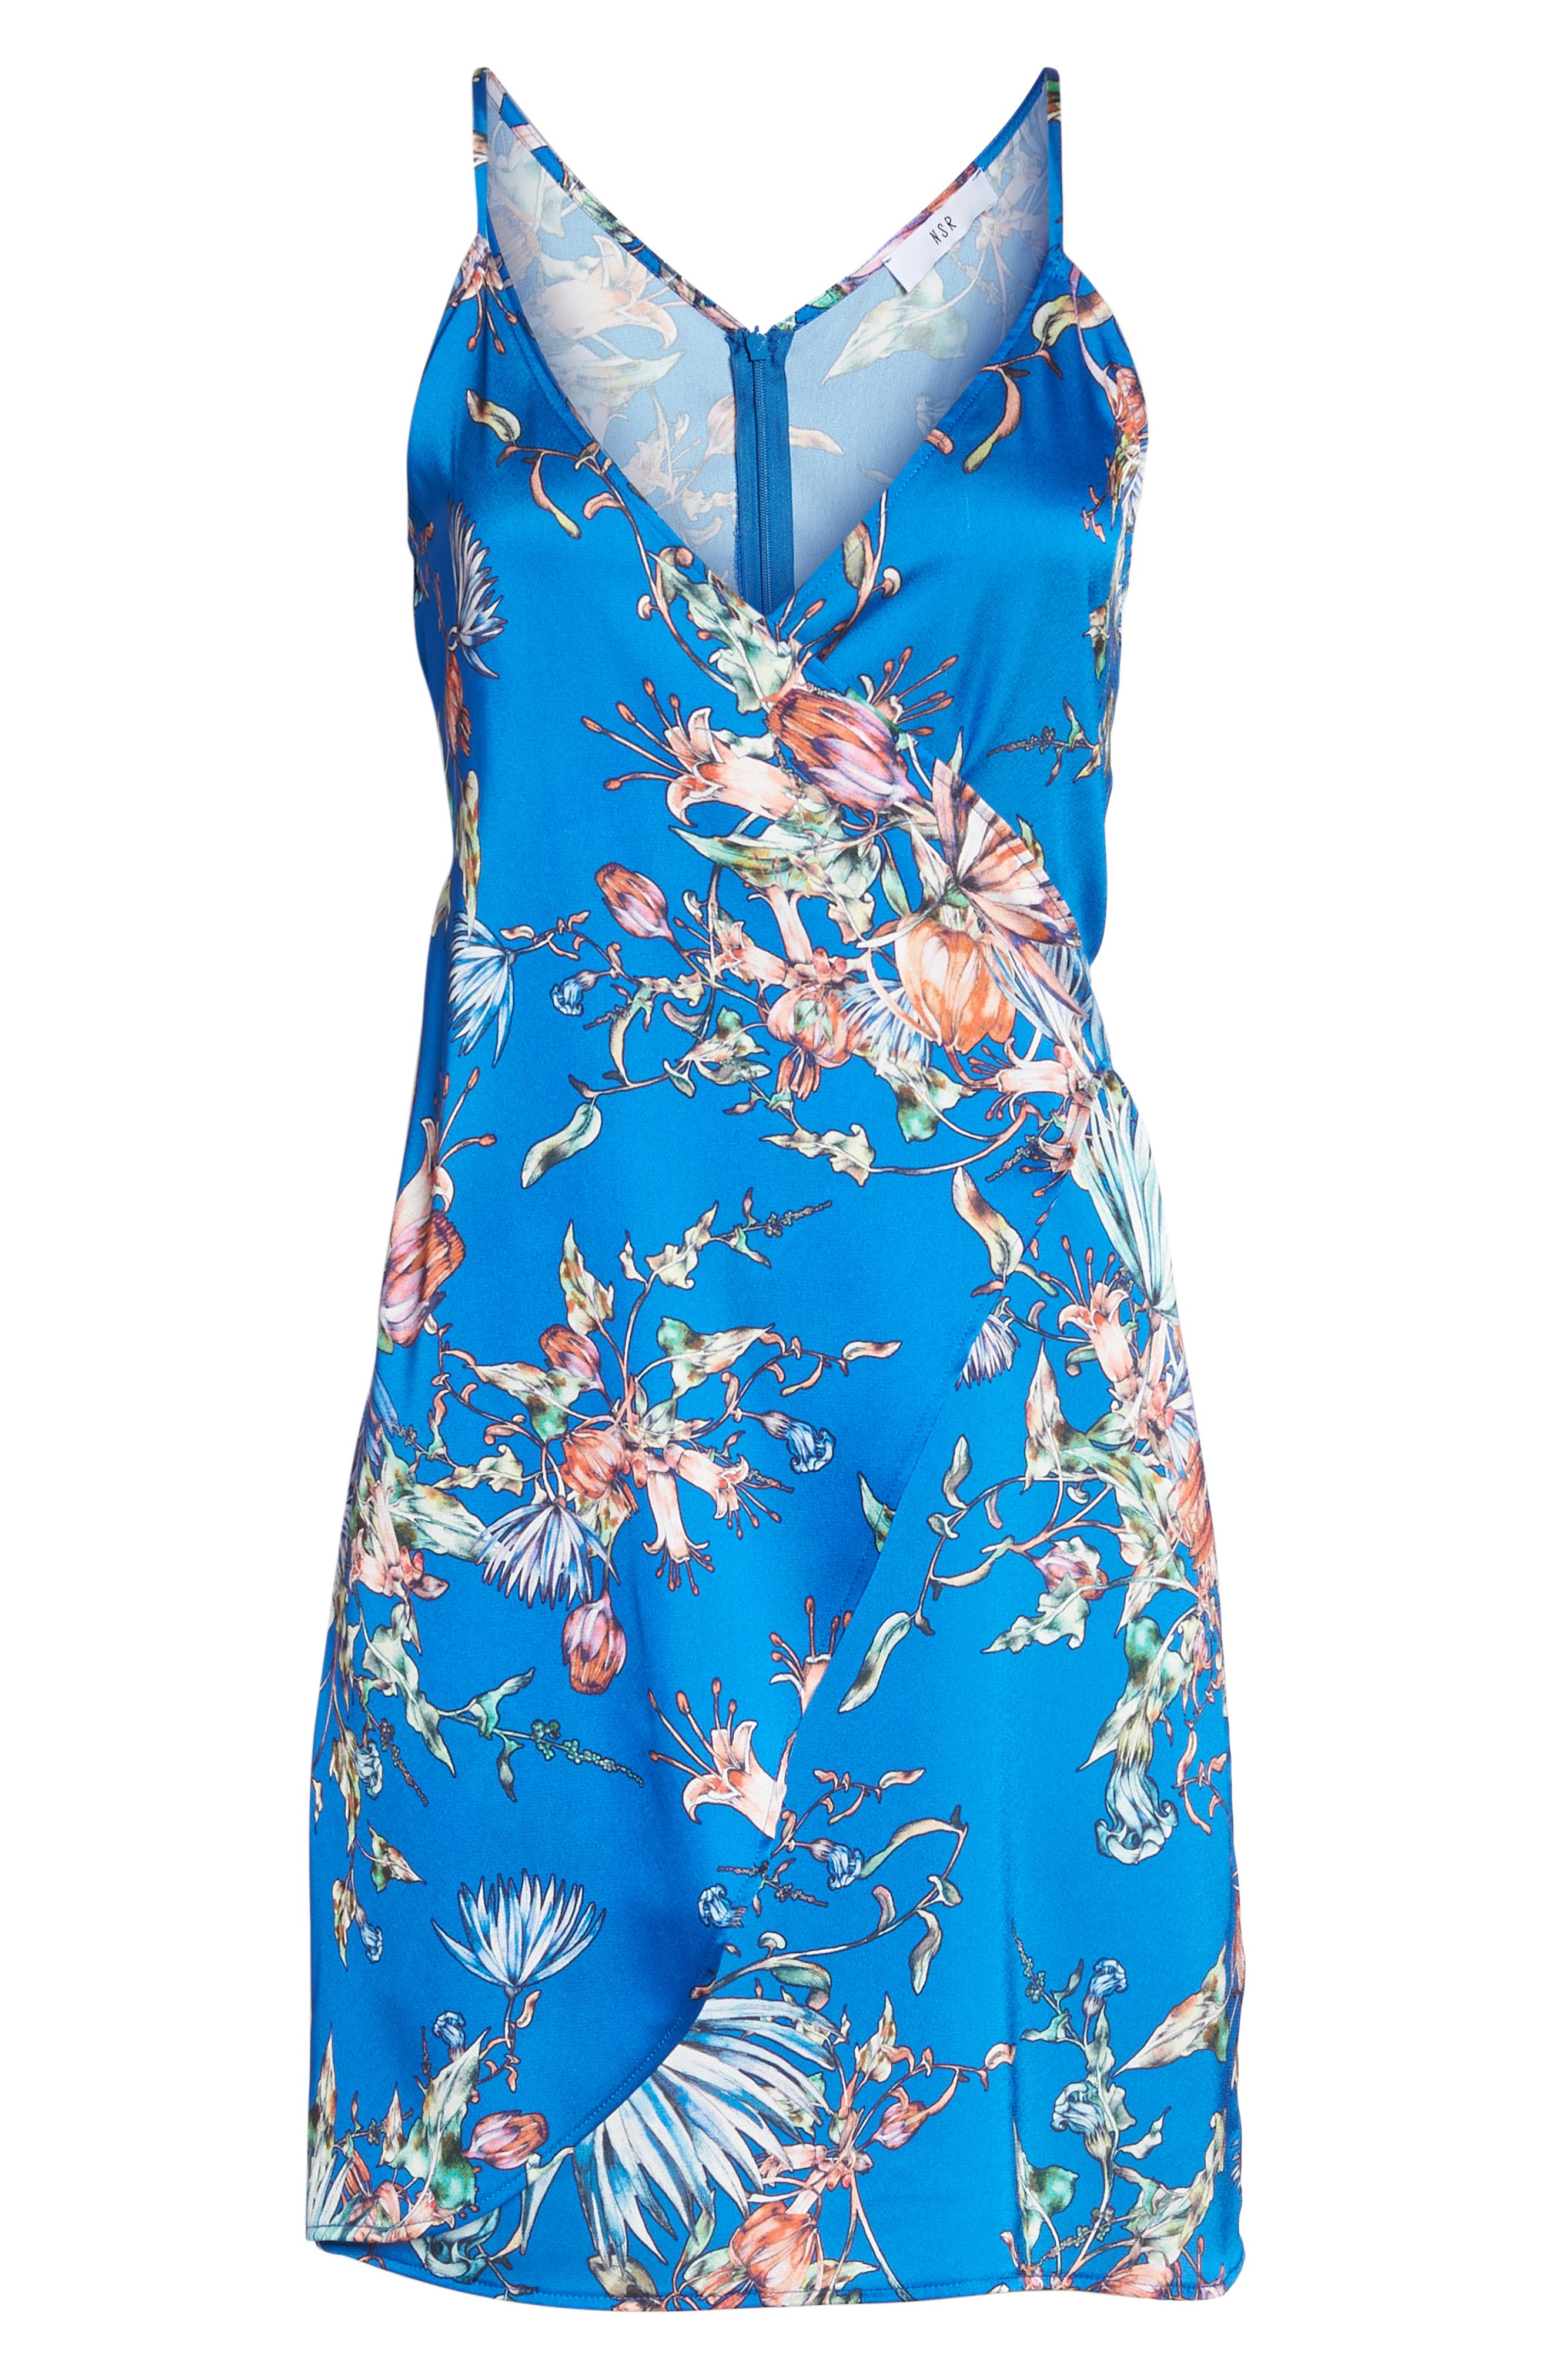 Floral Print Satin Faux Wrap Dress,                             Alternate thumbnail 7, color,                             Royal